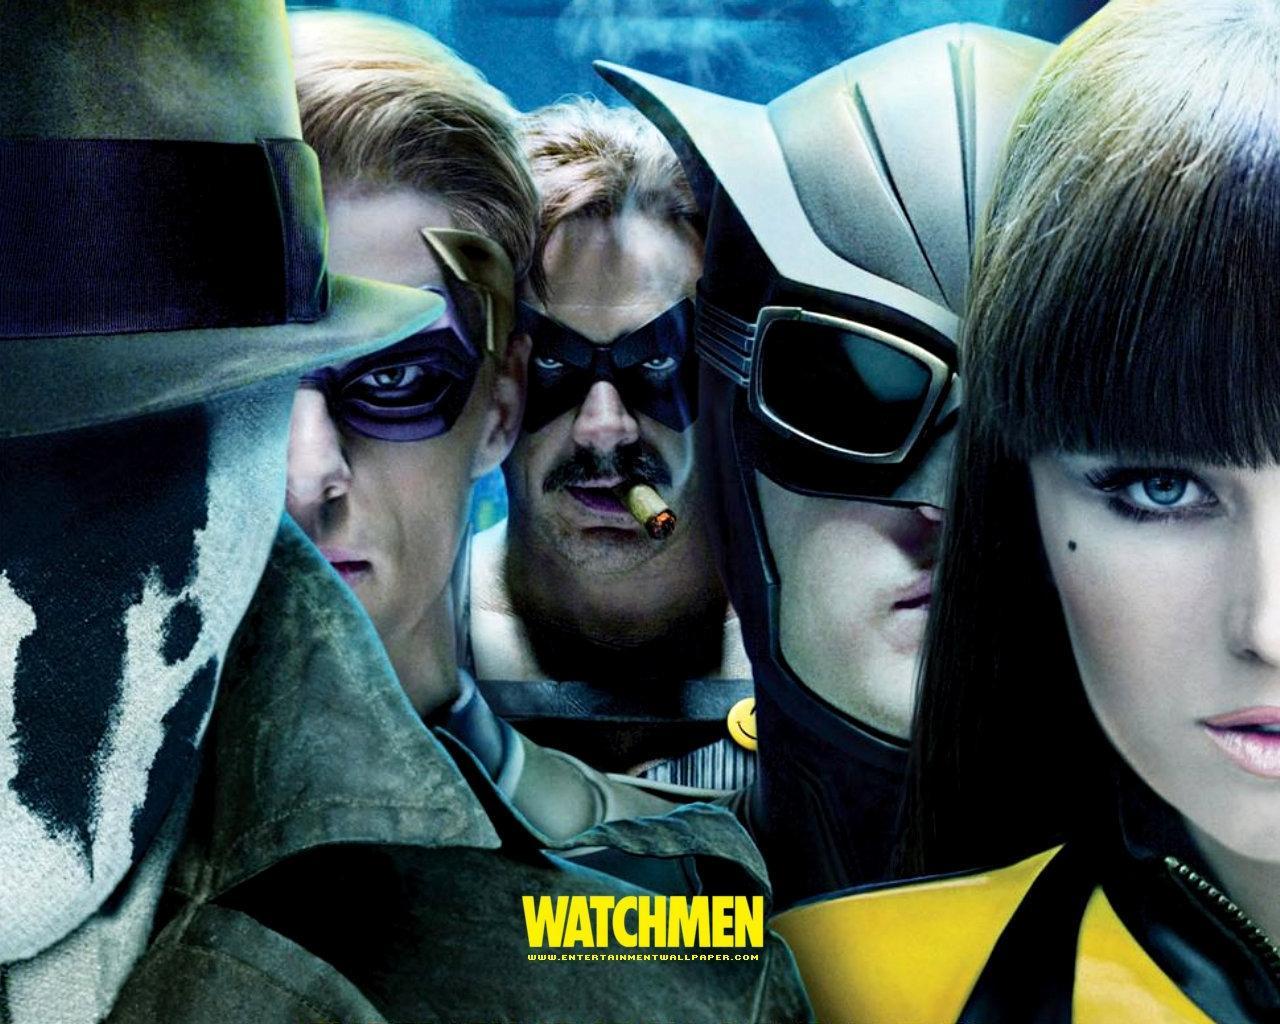 Images Watchmen Movies film